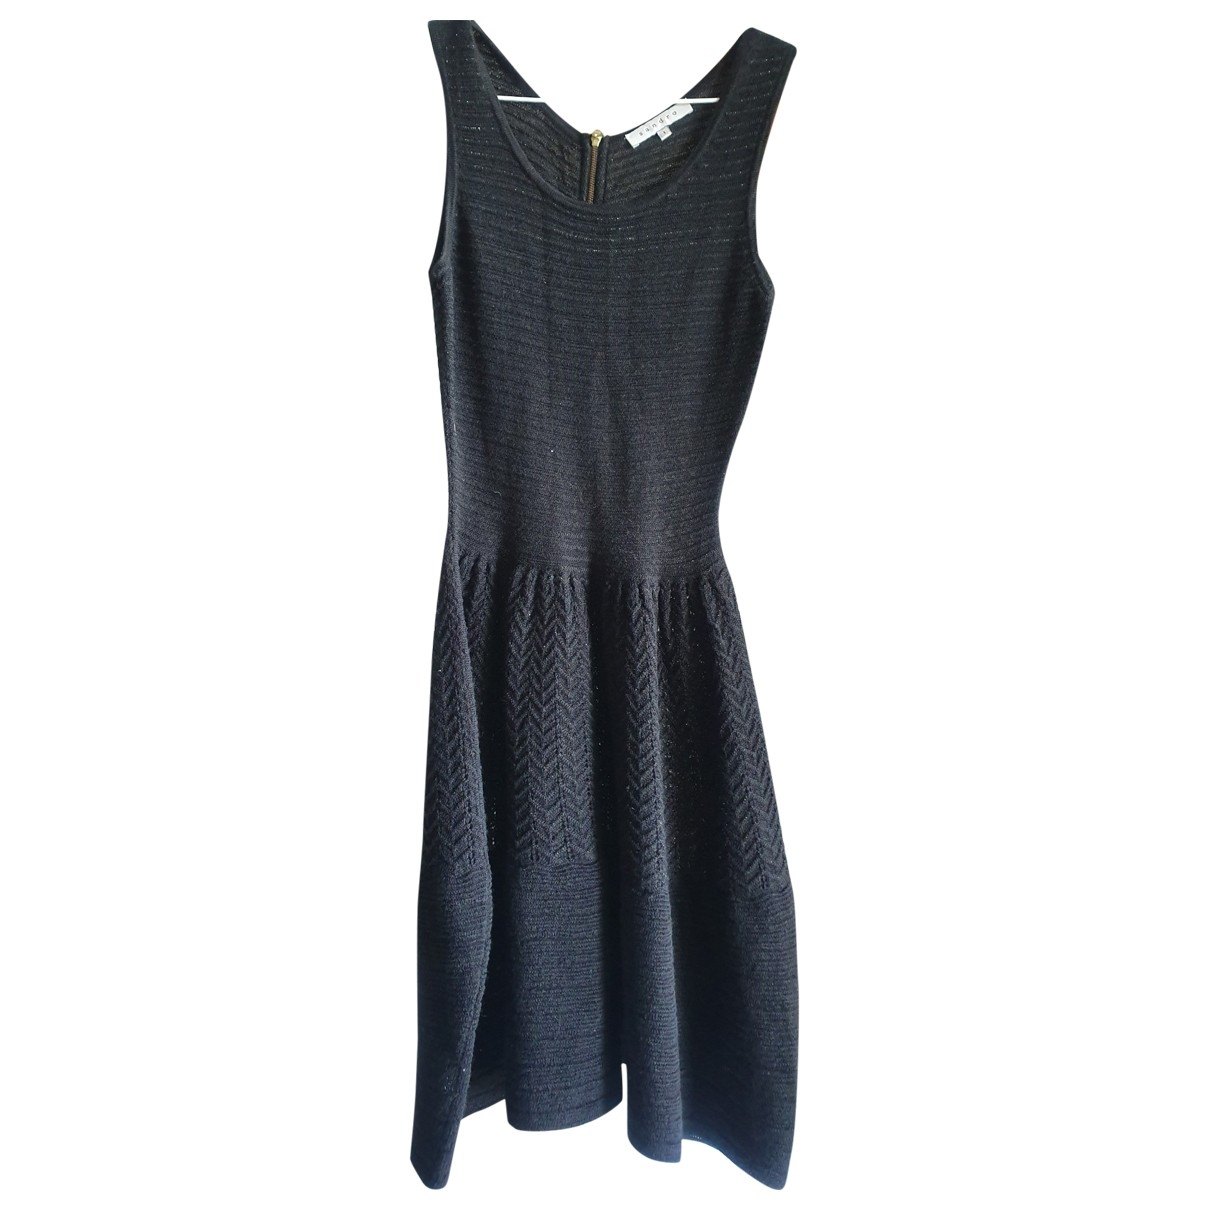 Sandro - Robe   pour femme en laine - noir